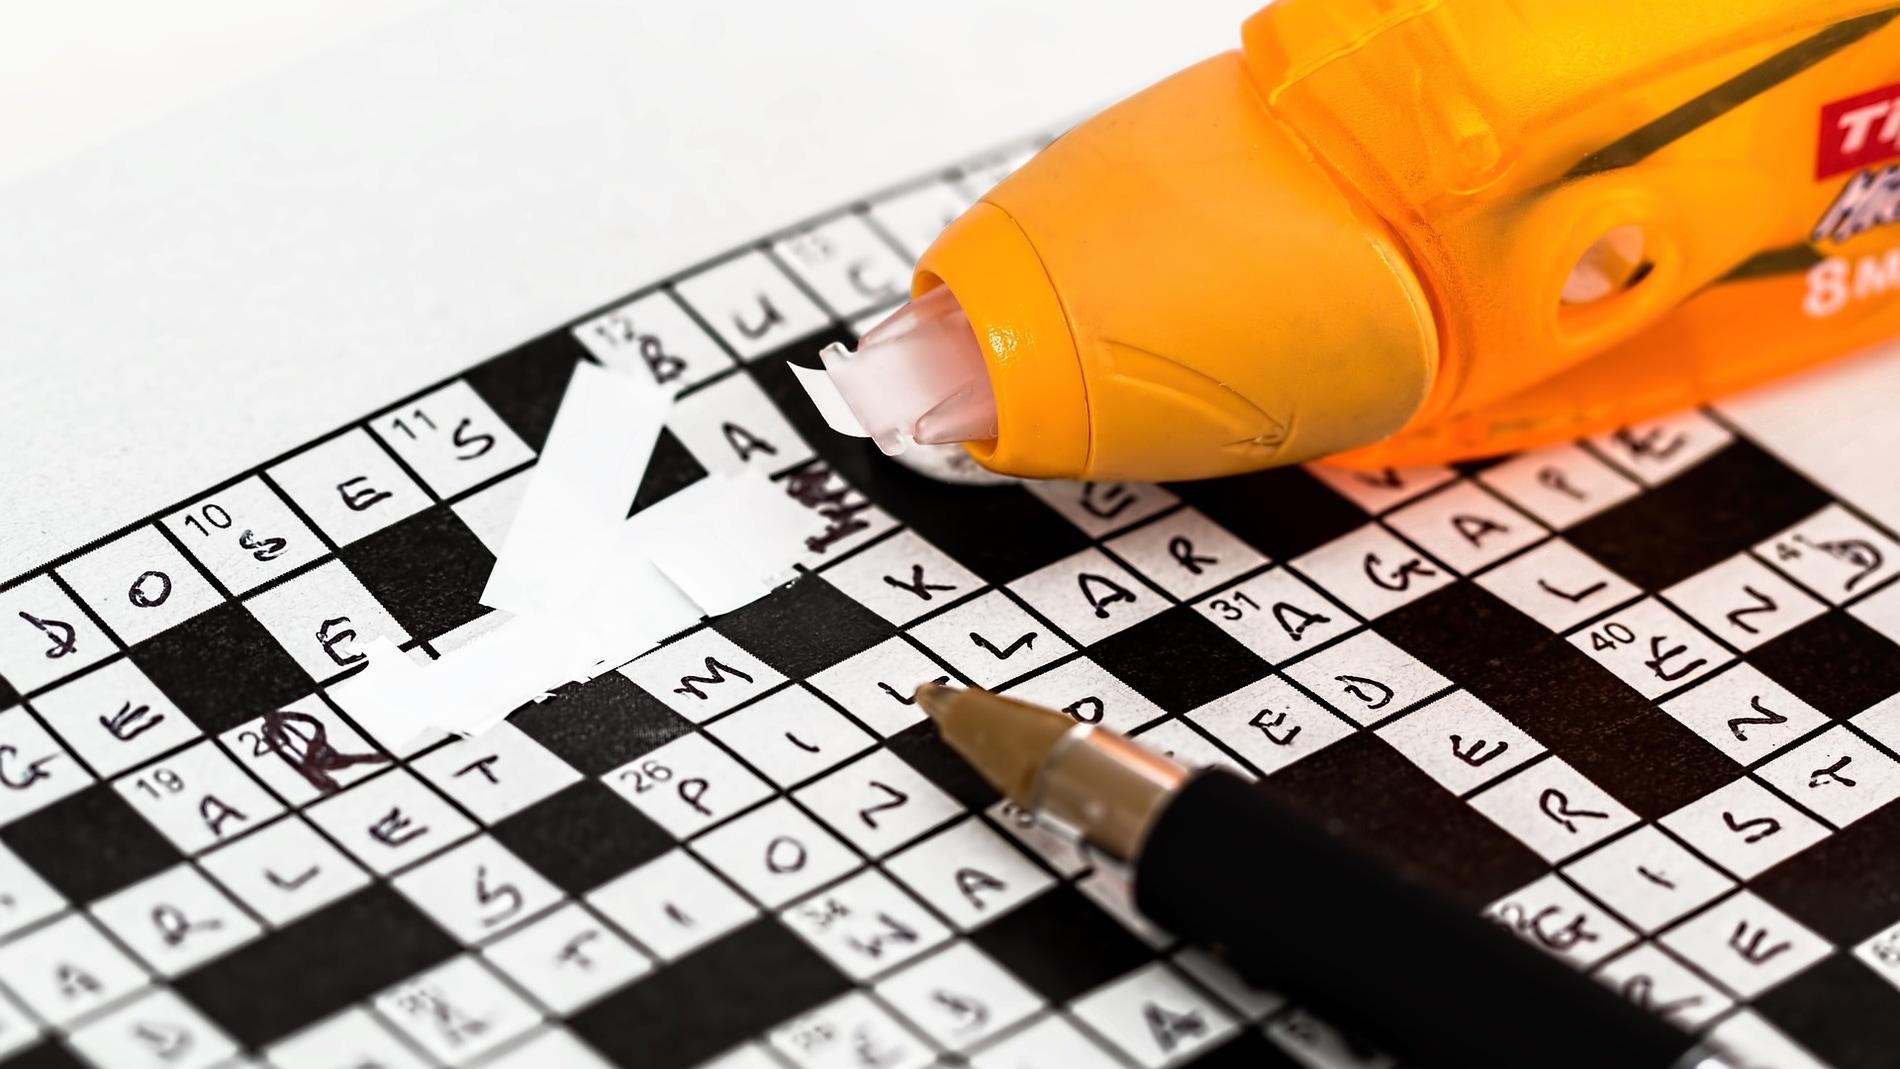 Descifrar un crucigrama